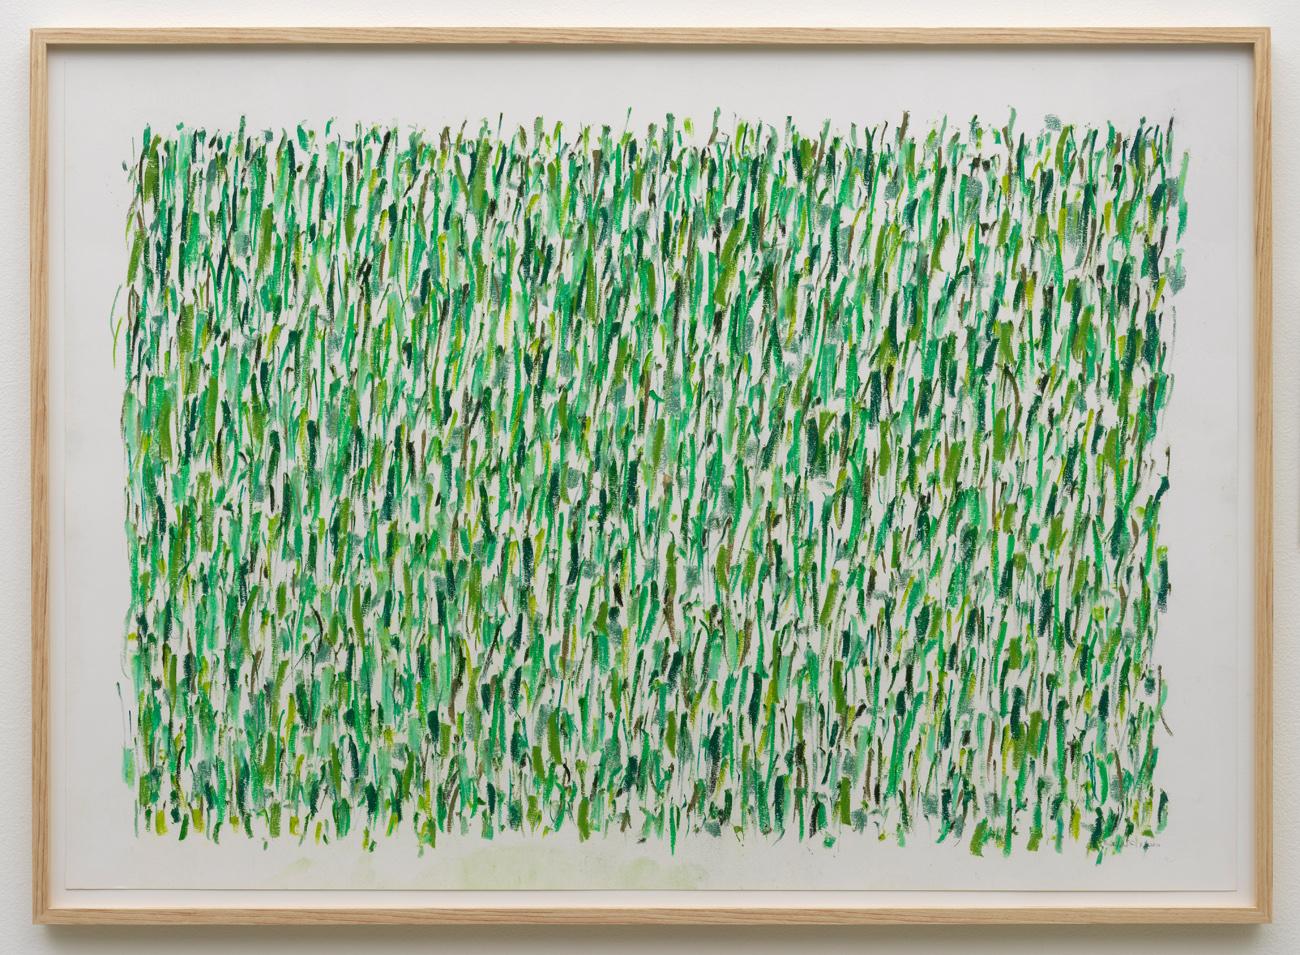 herman de vries, untitled (green:19x), 2012